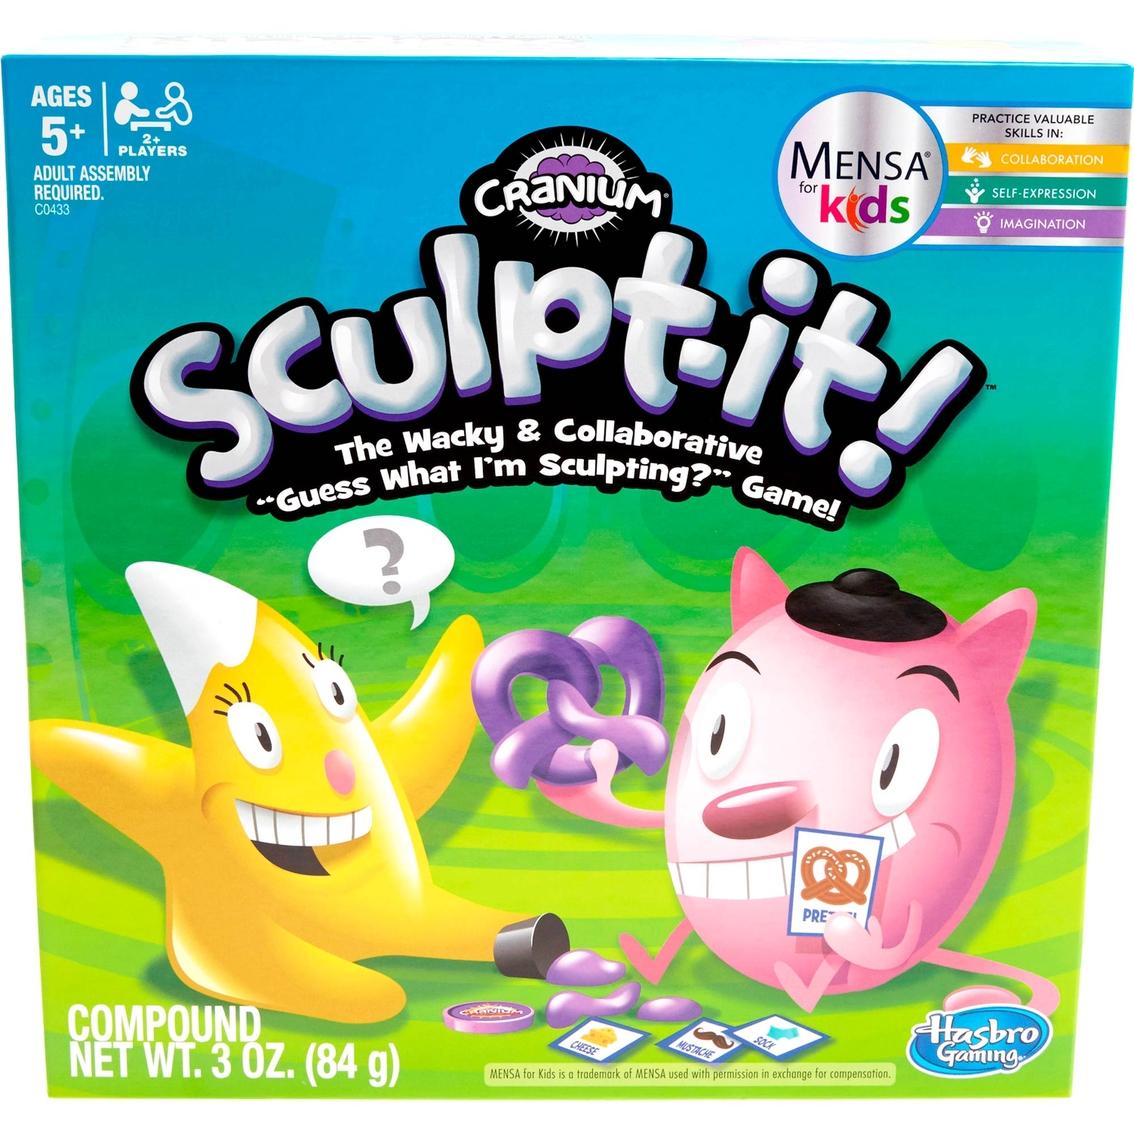 Hasbro Cranium Sculpt It Game Games Baby Toys Shop The Exchange